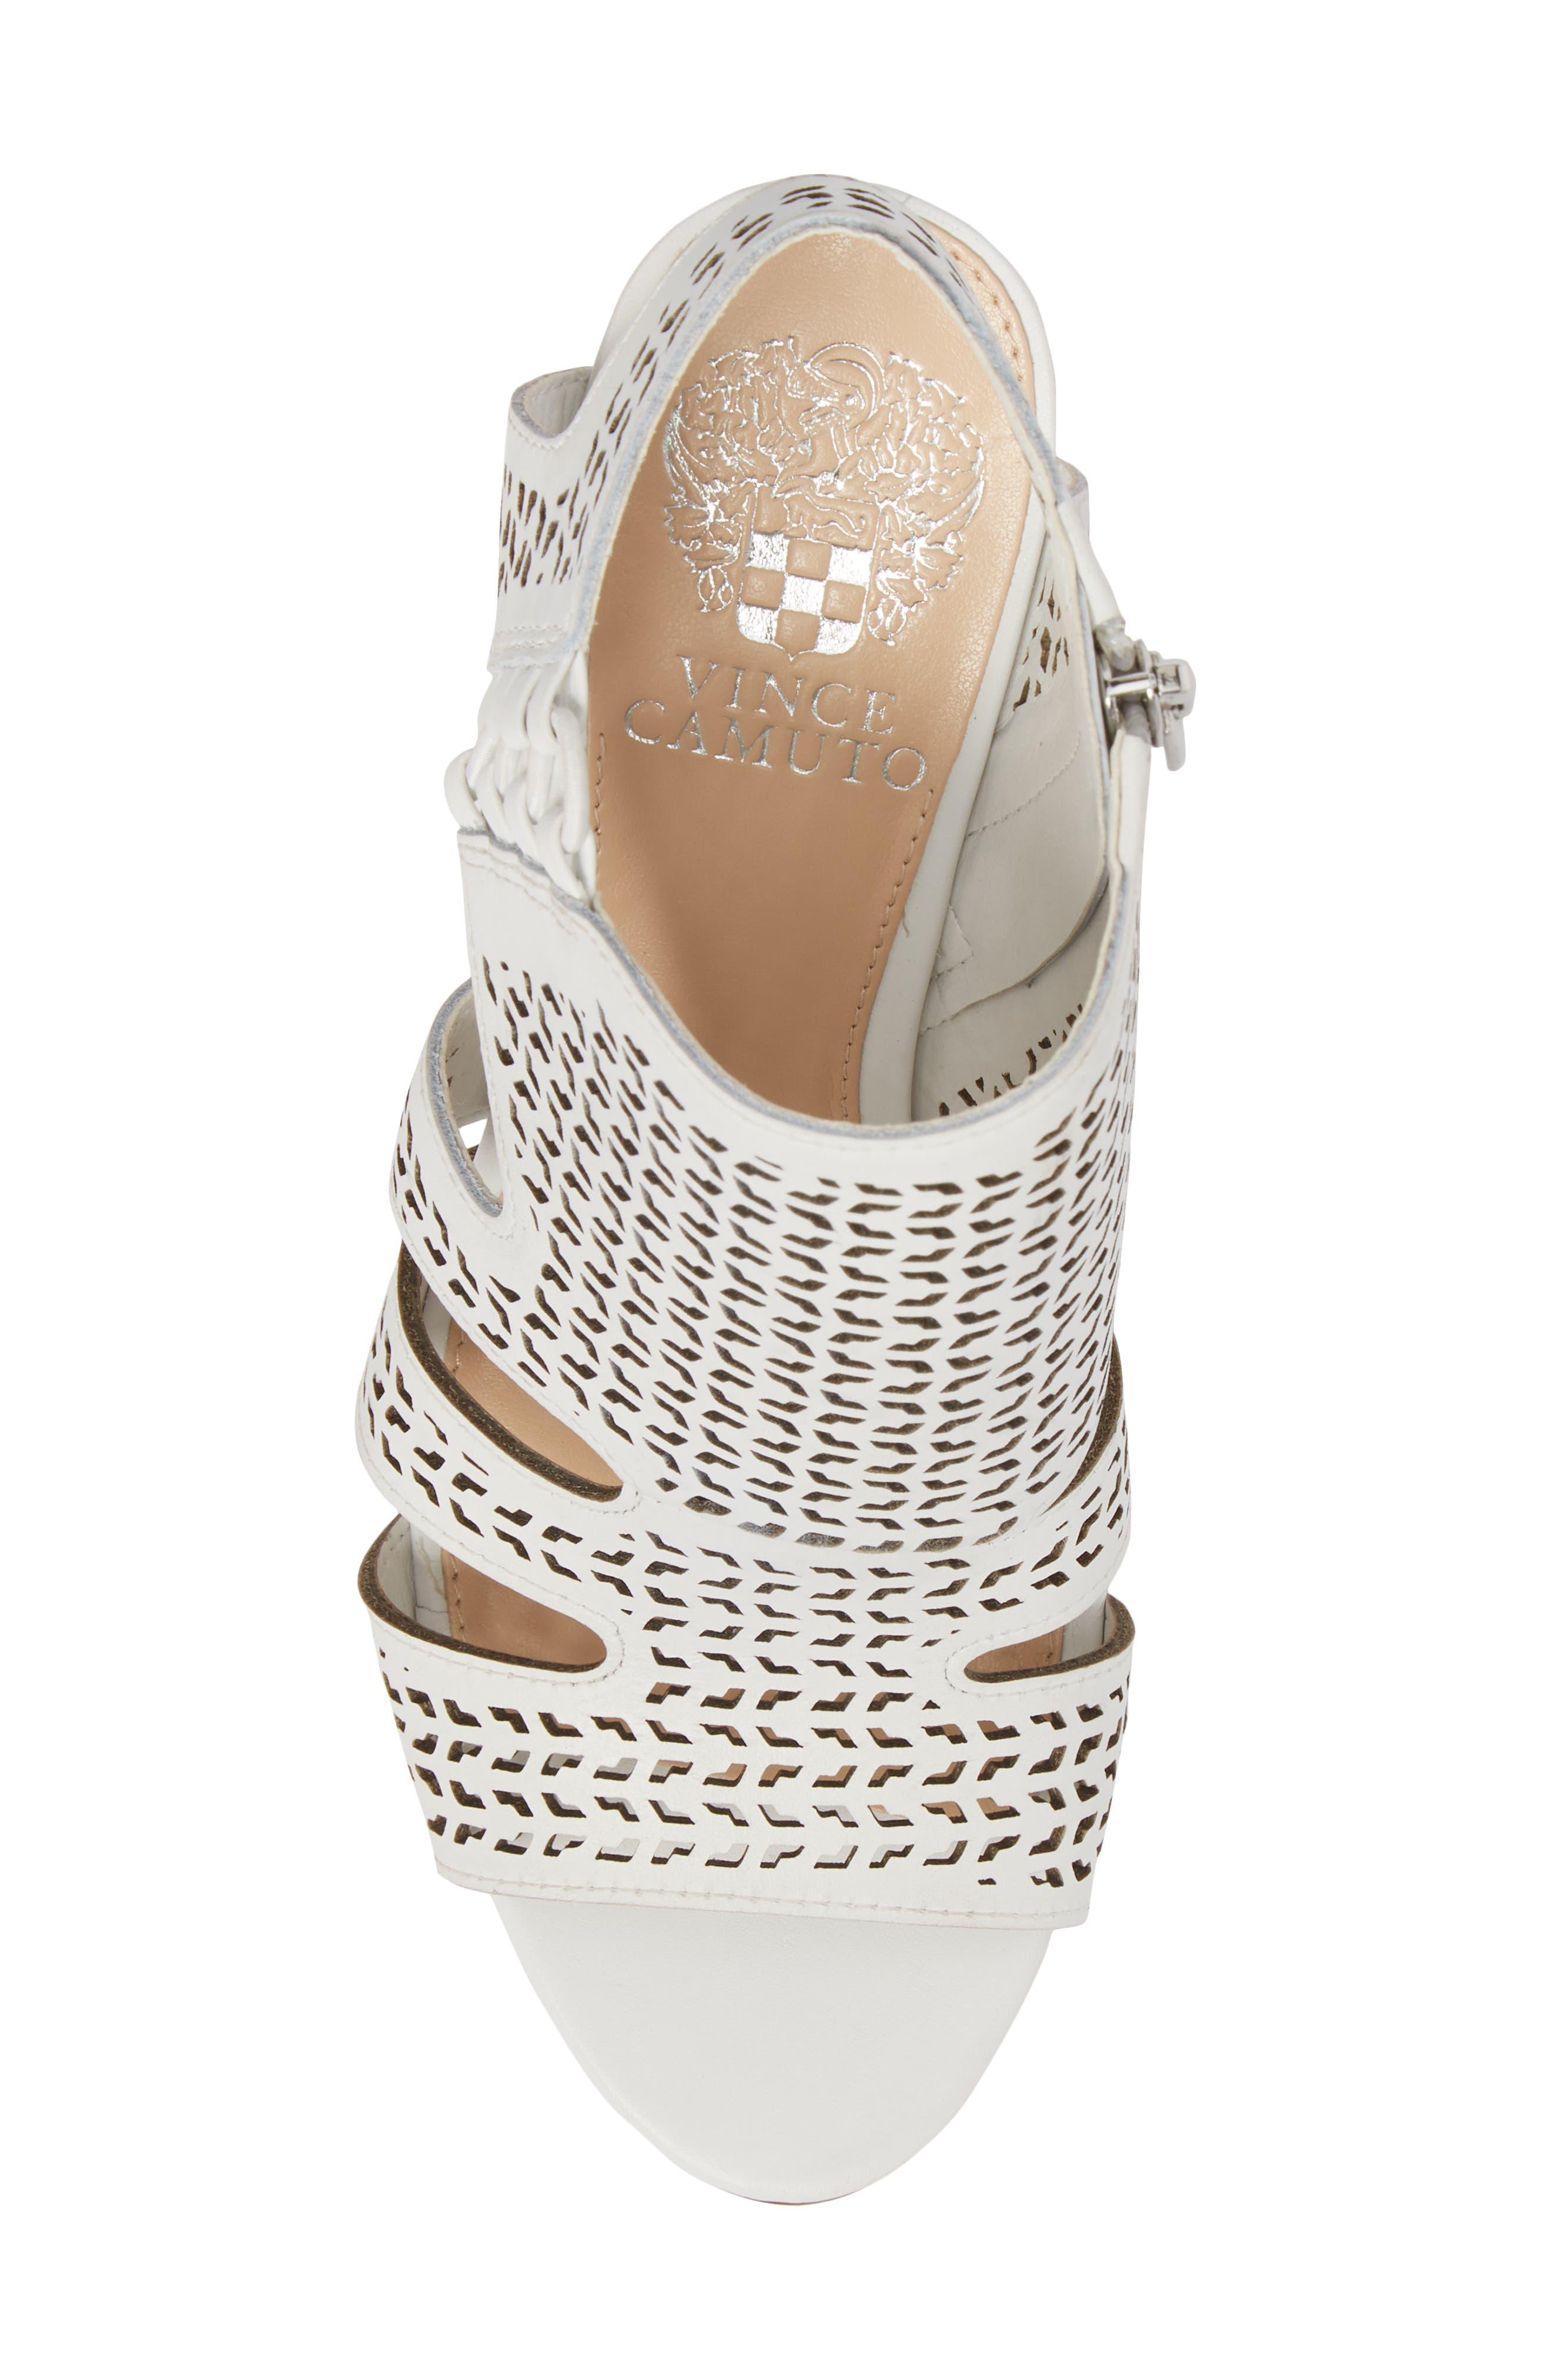 Esten Perforated Sandal,                             Alternate thumbnail 5, color,                             Pure Leather